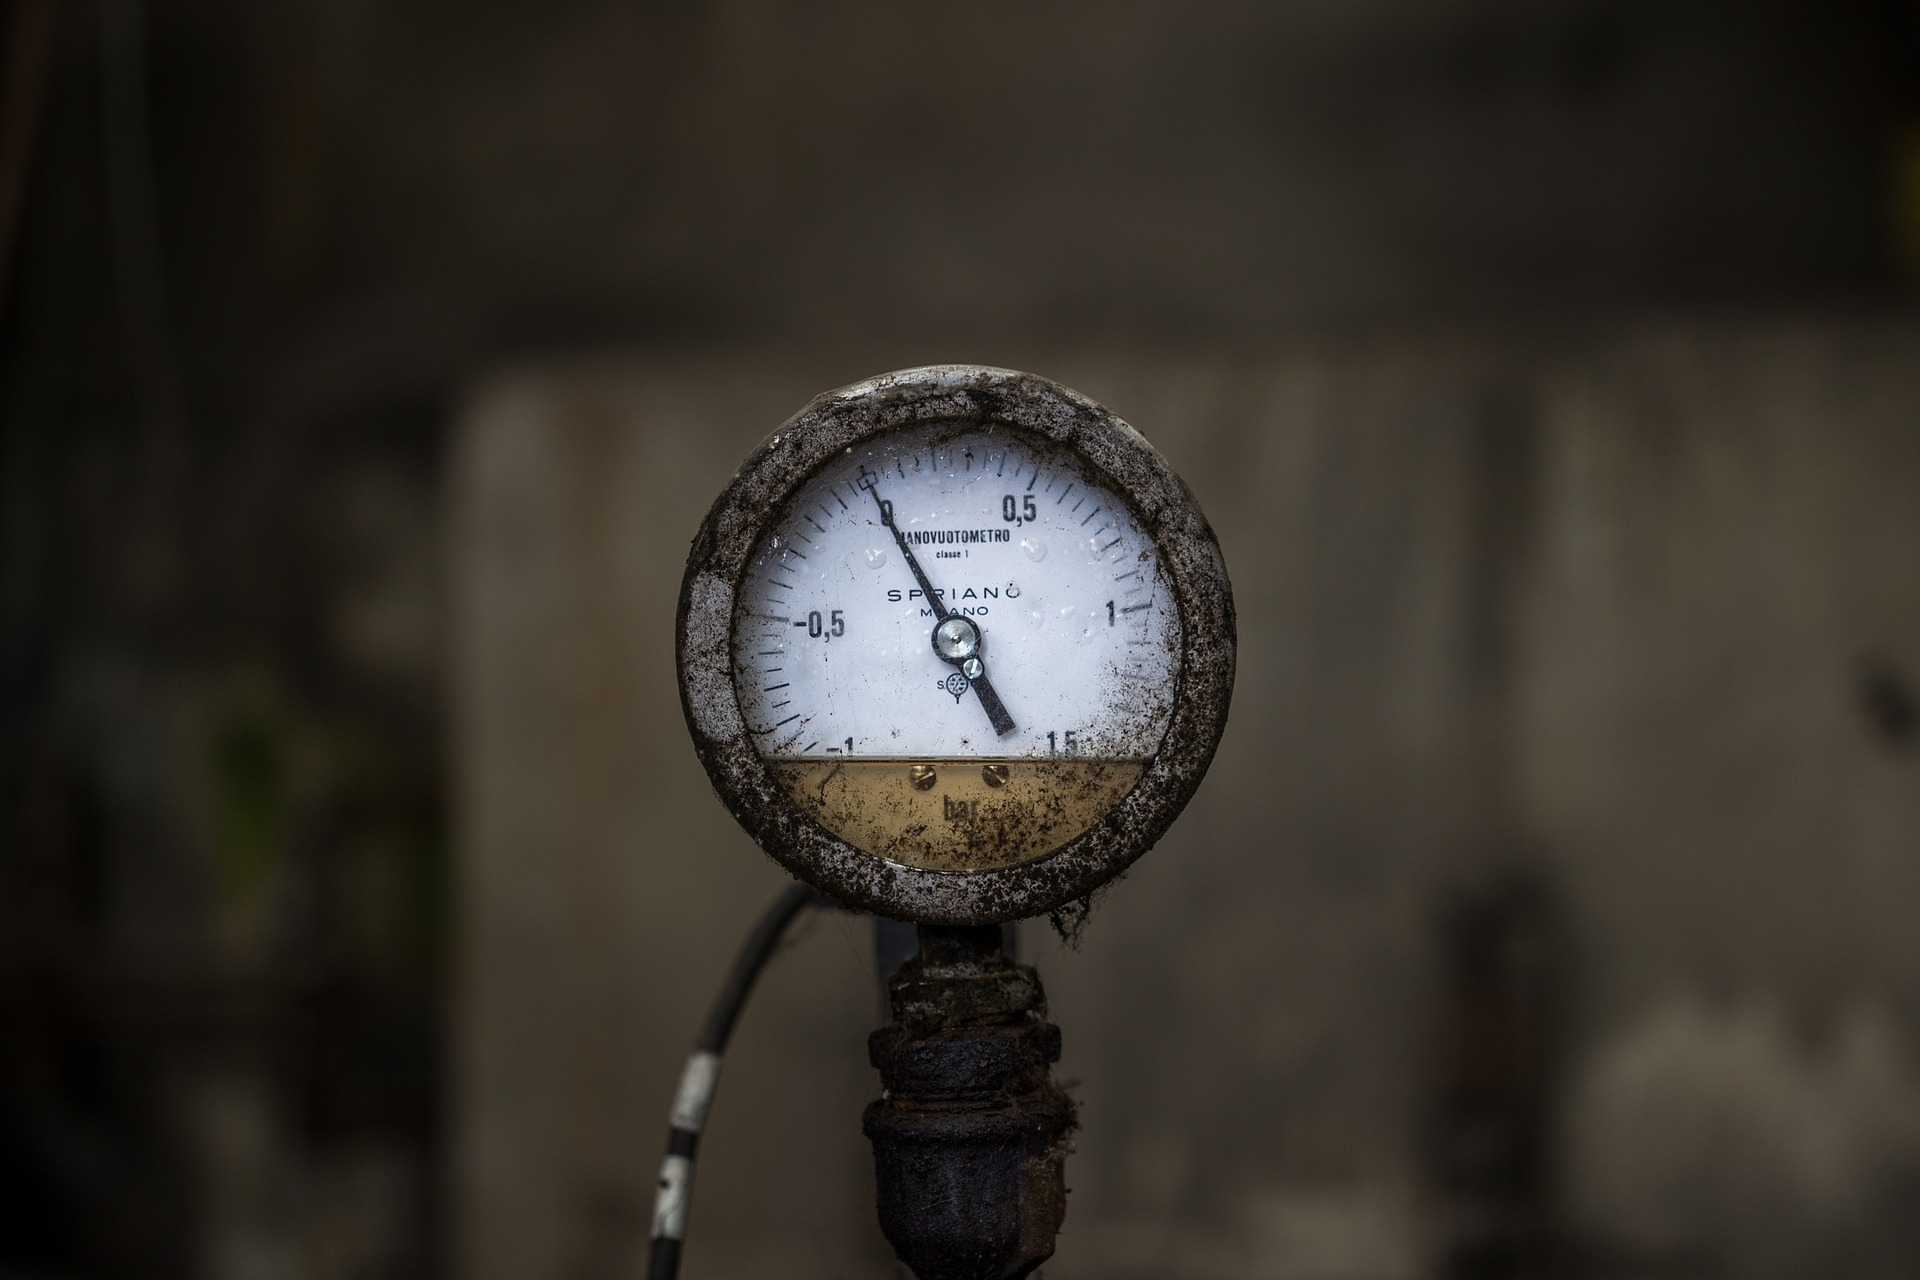 pressure-690161_1920